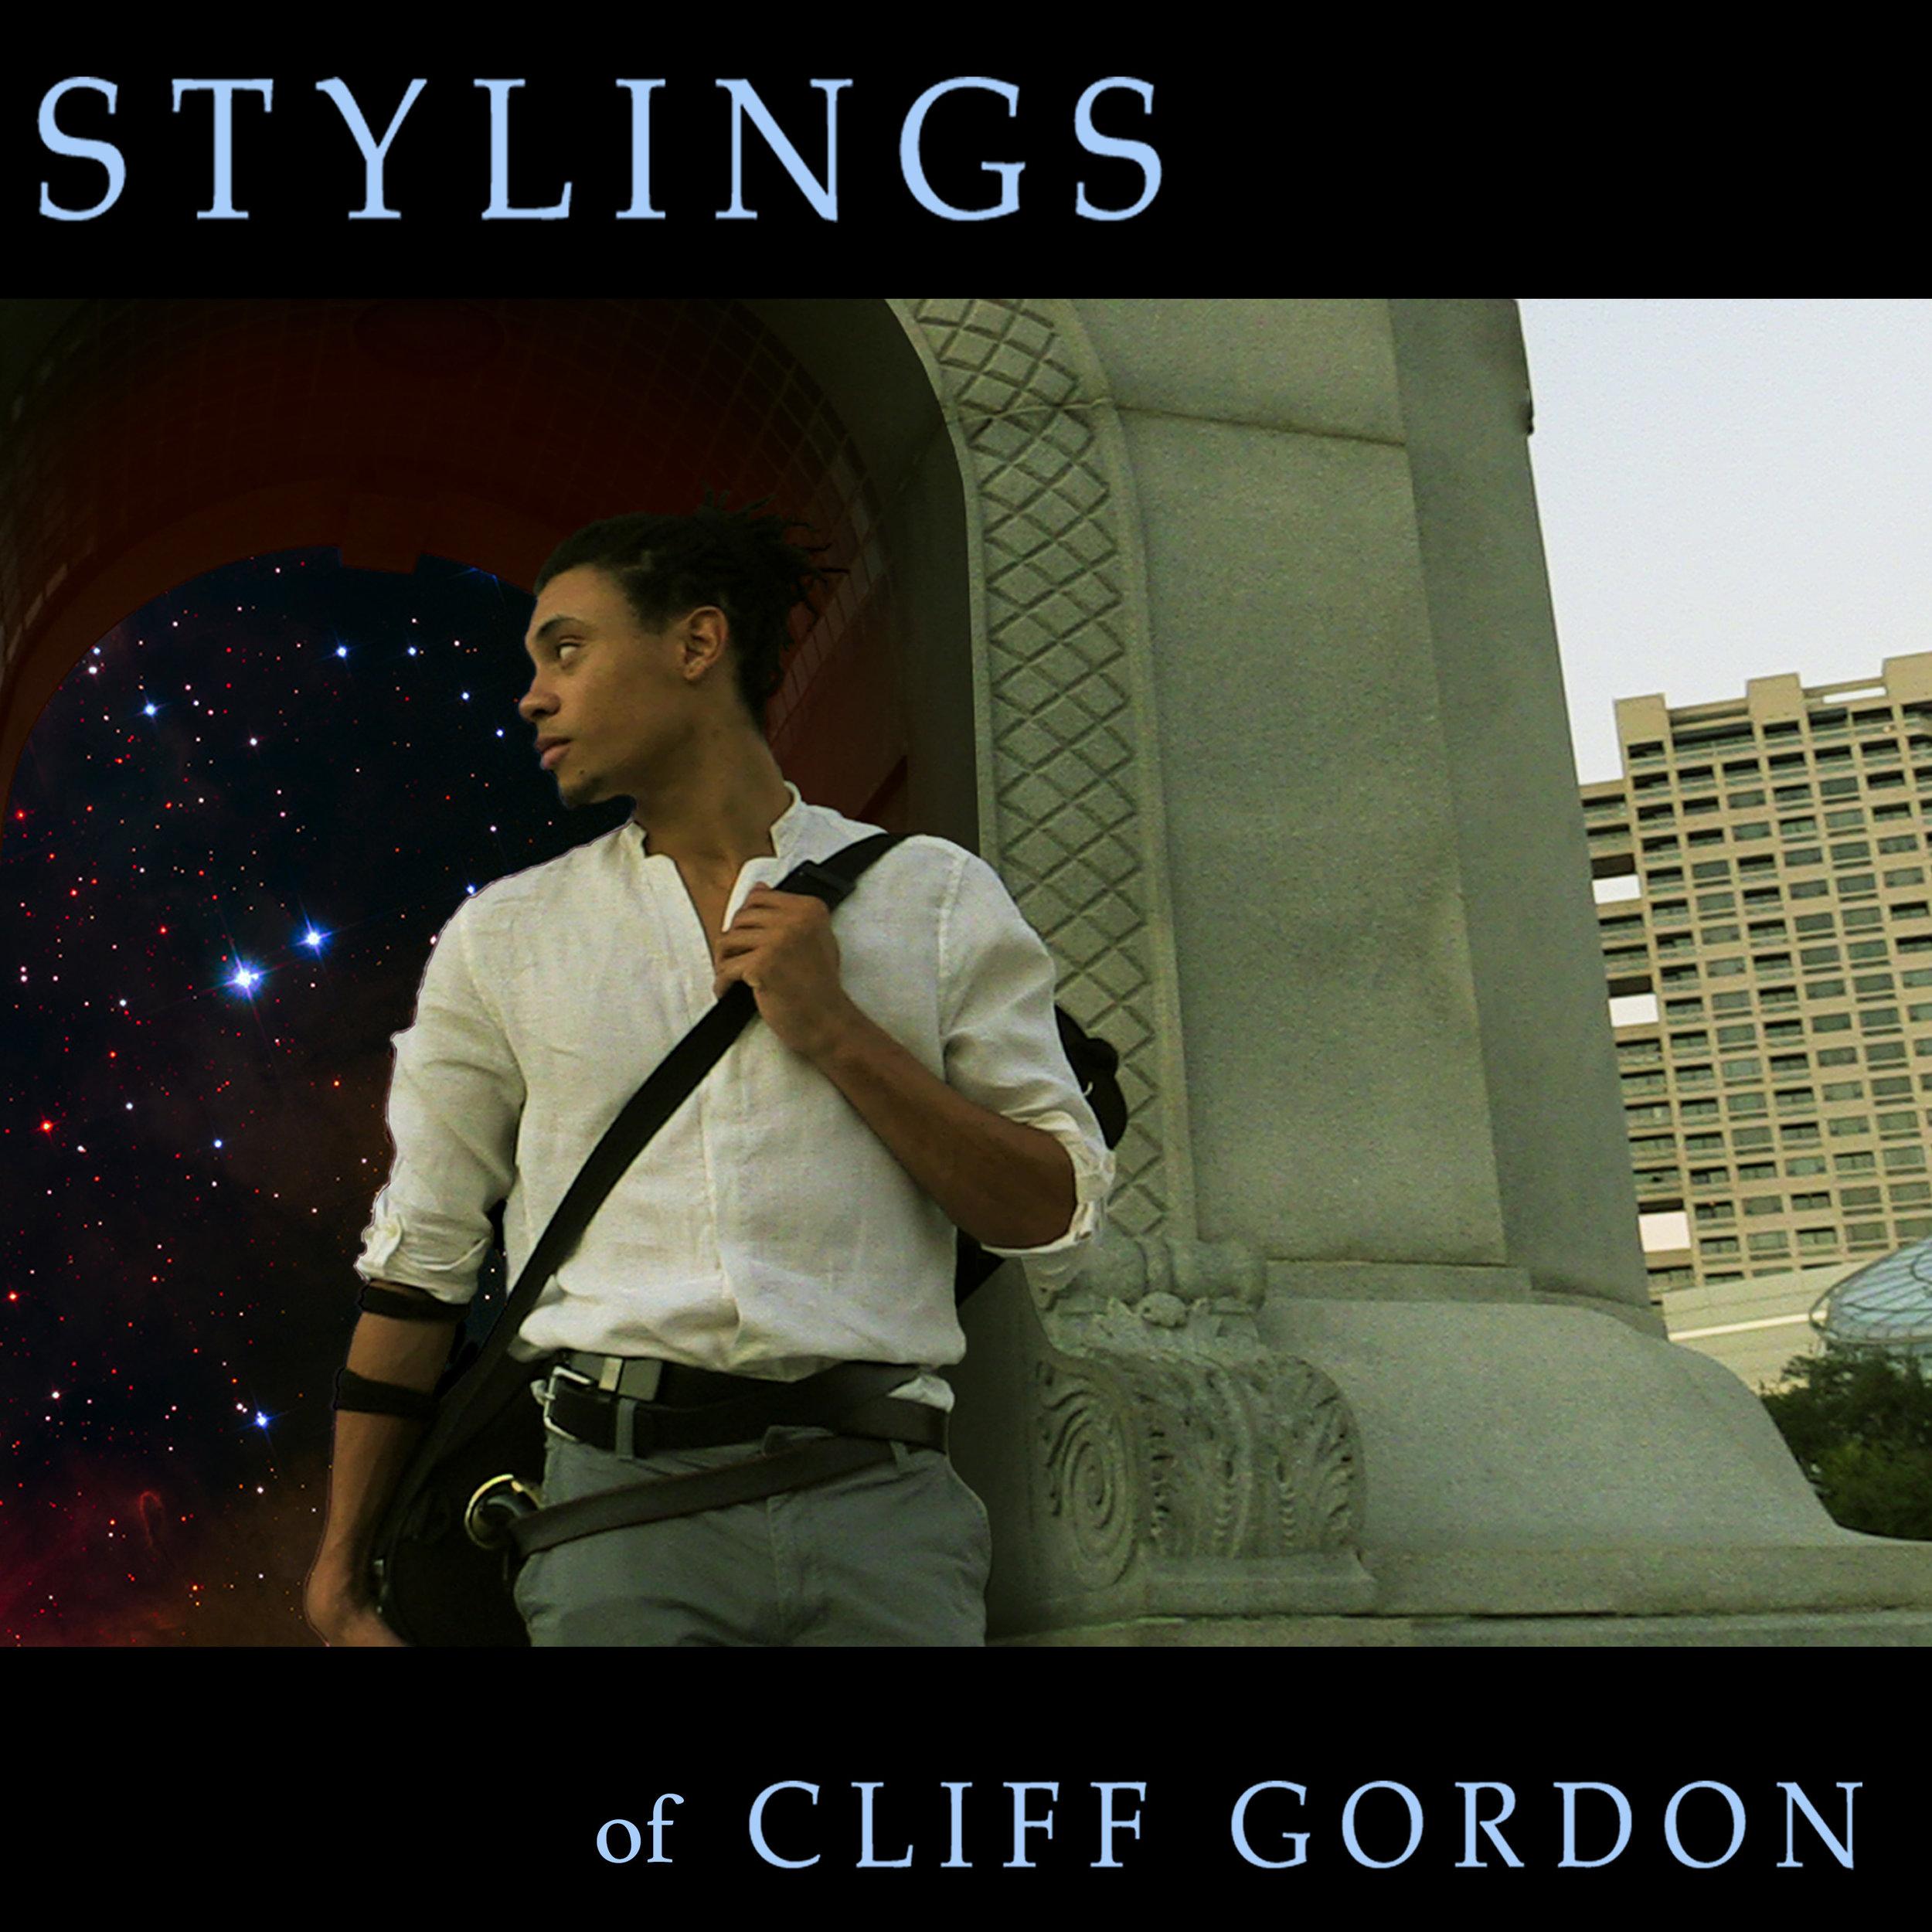 StylingsOfCliffGordon(front) (1).jpg